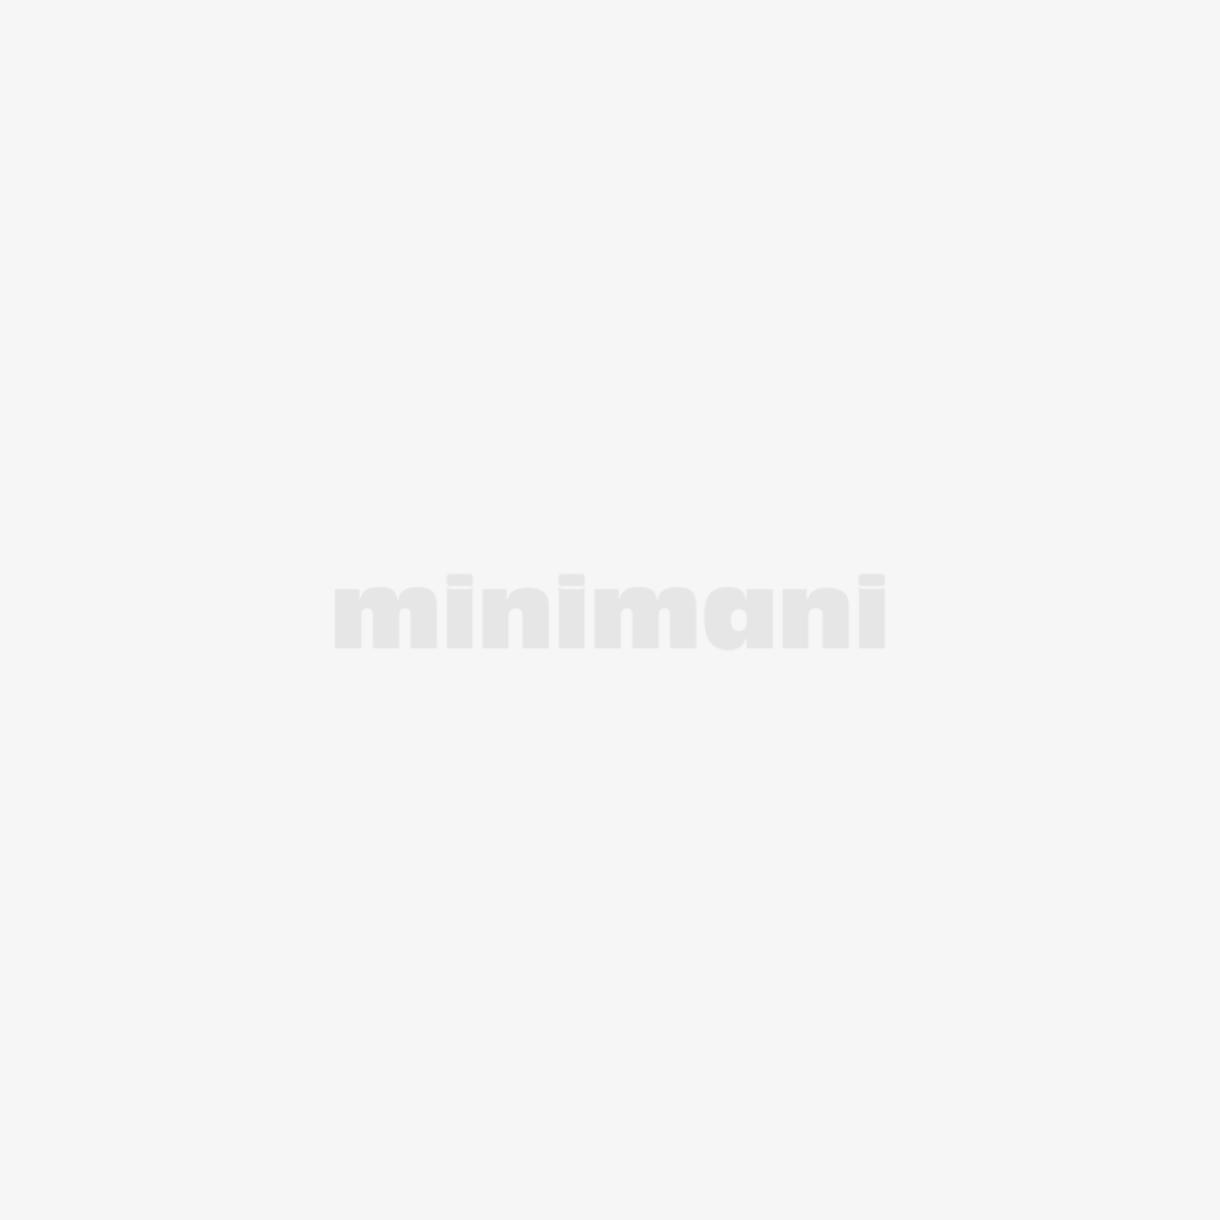 STANLEY STANLEY LUMILINKO  S-ST 196cc (57cm)